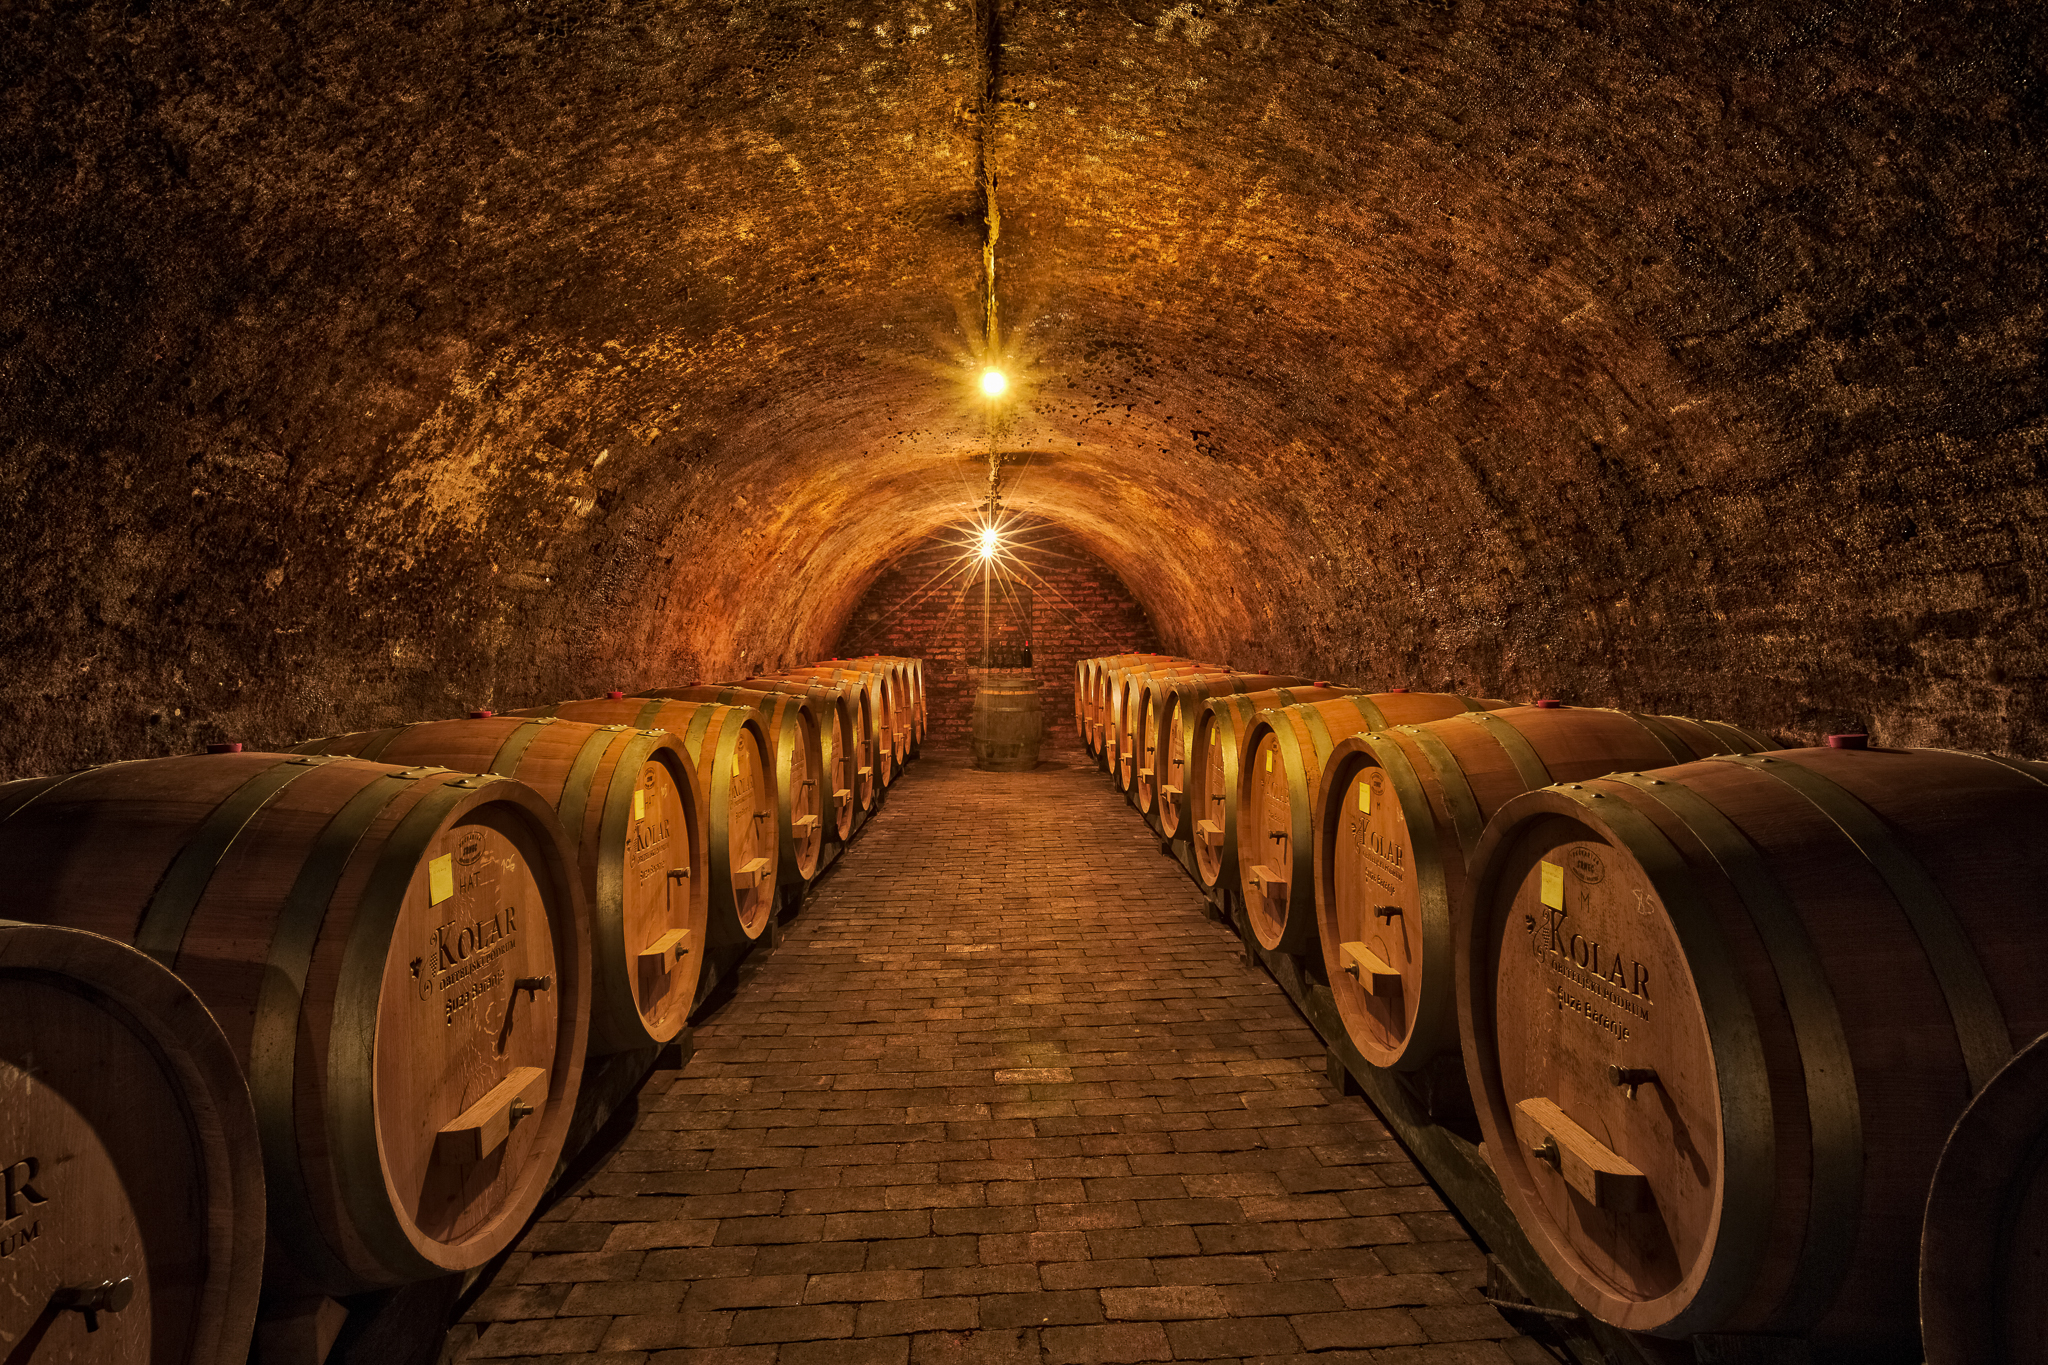 stari vinski podrum kolar baranja